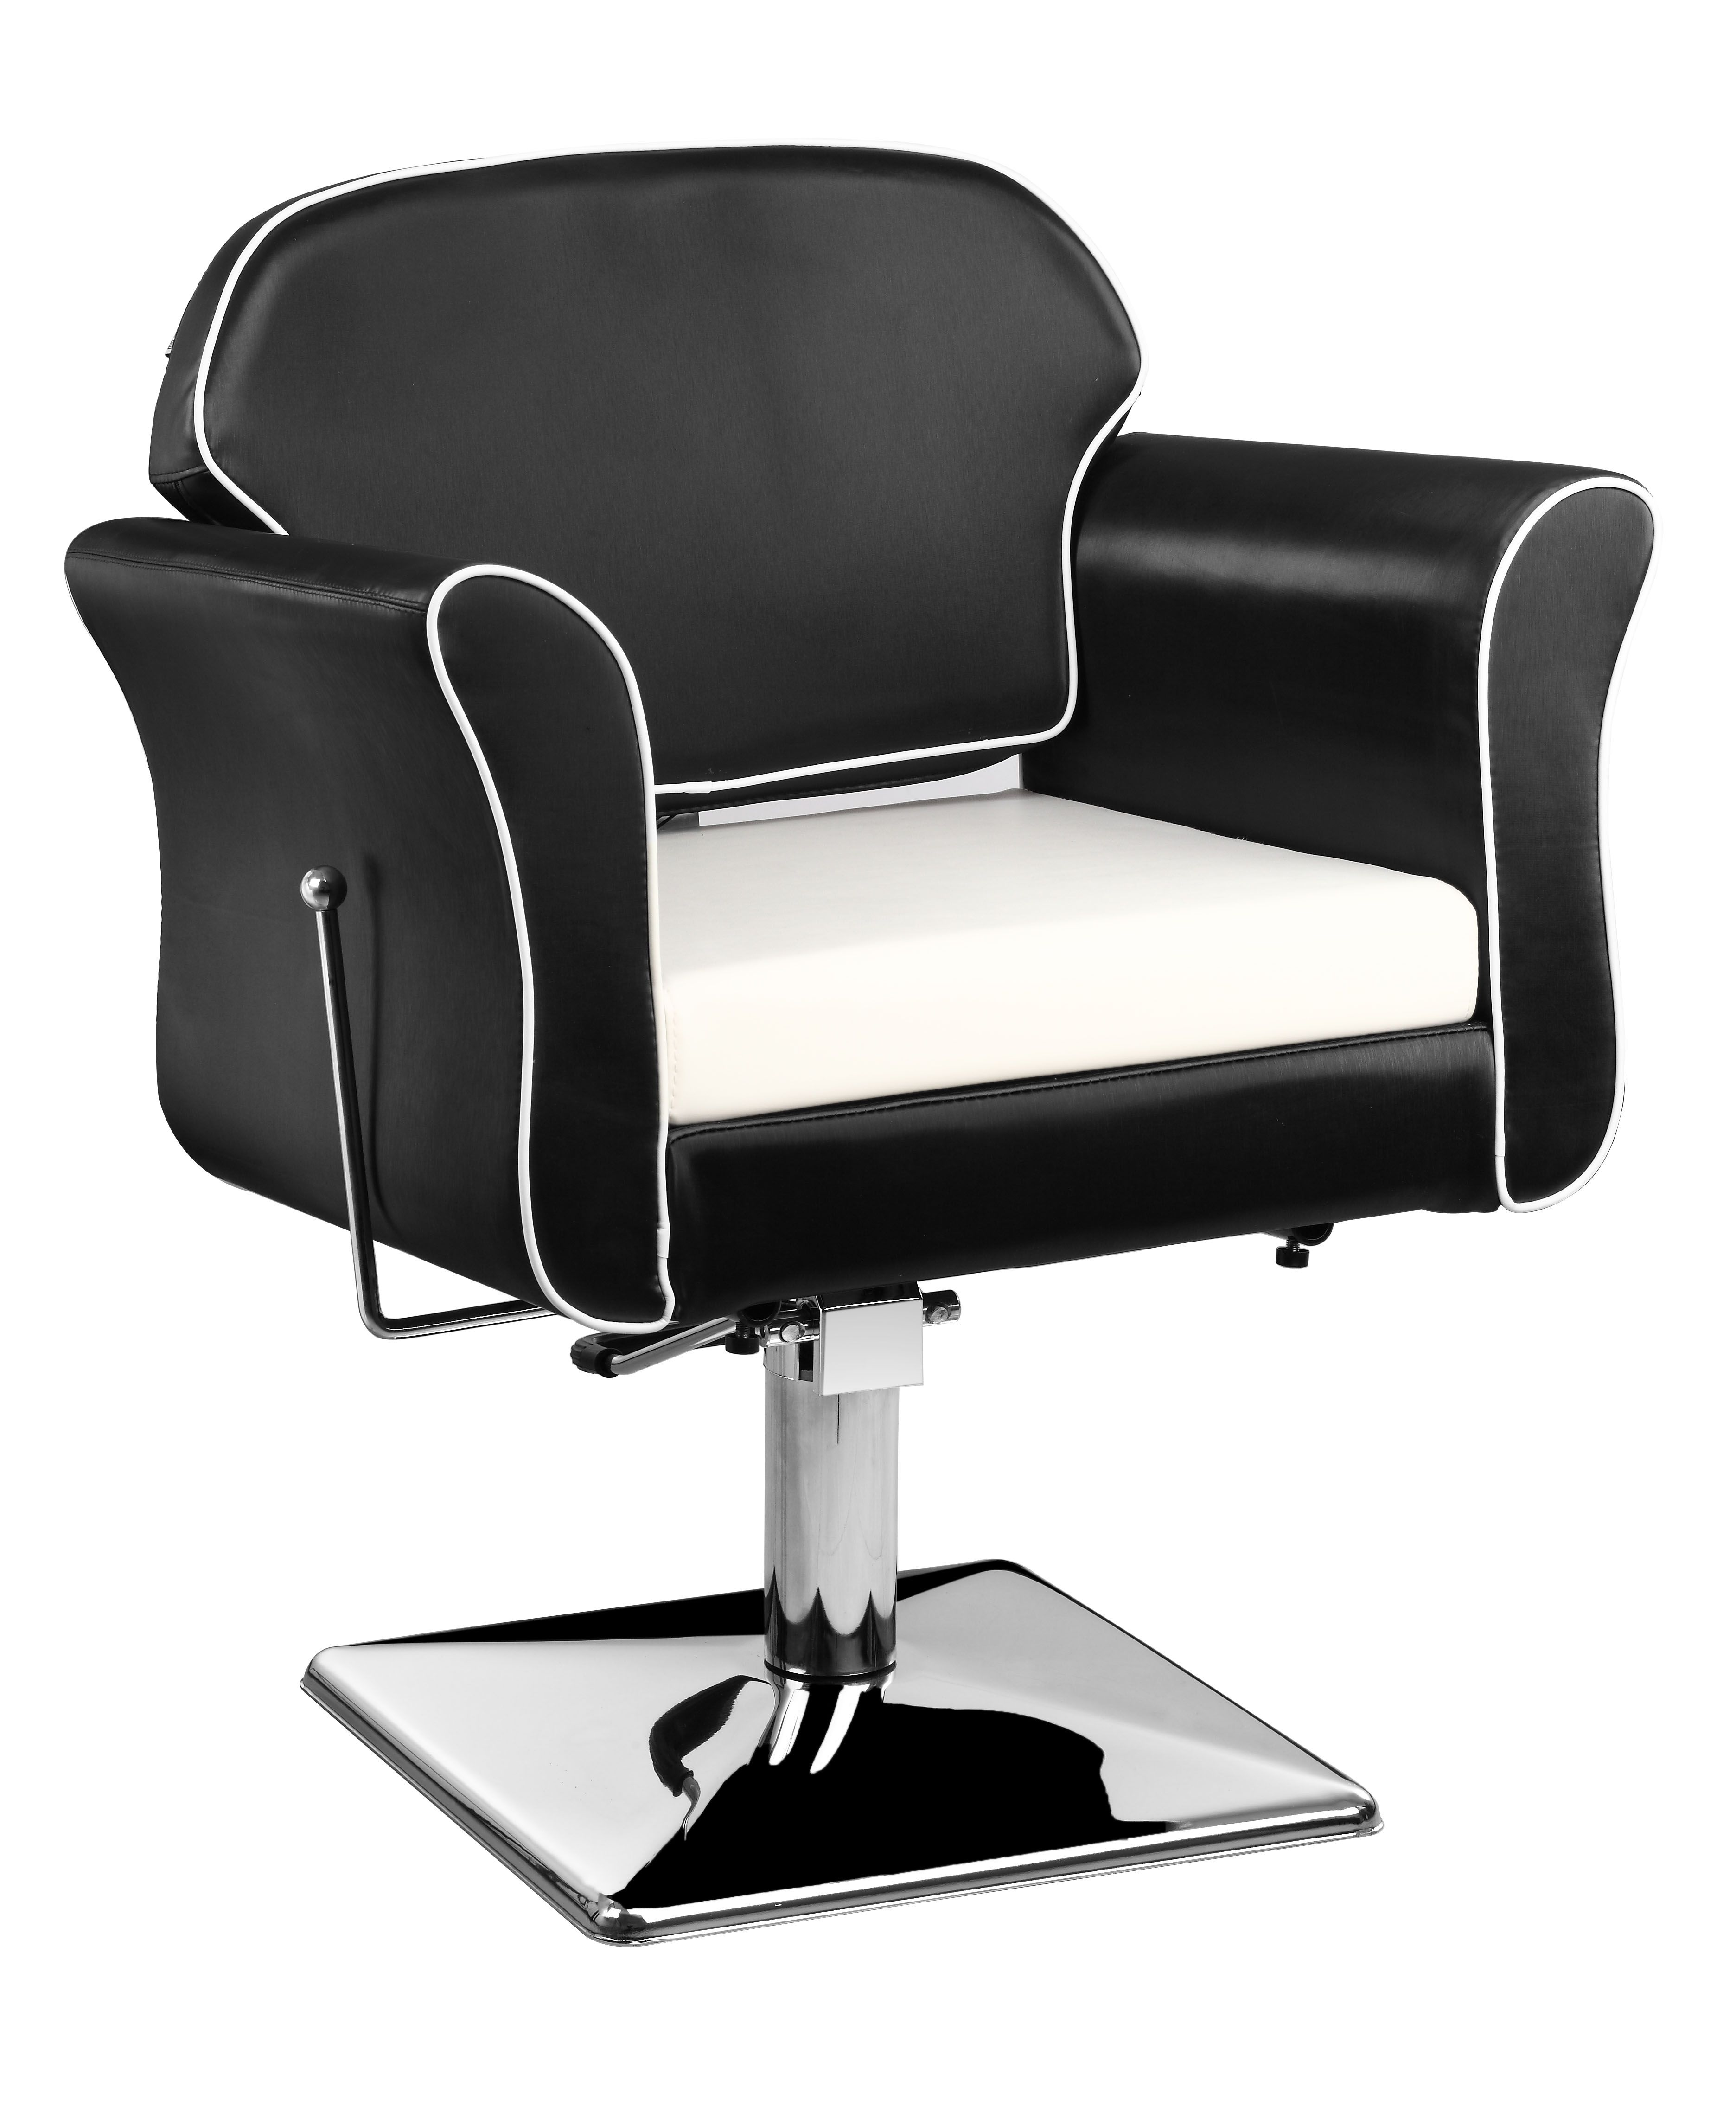 We sell salon furniture